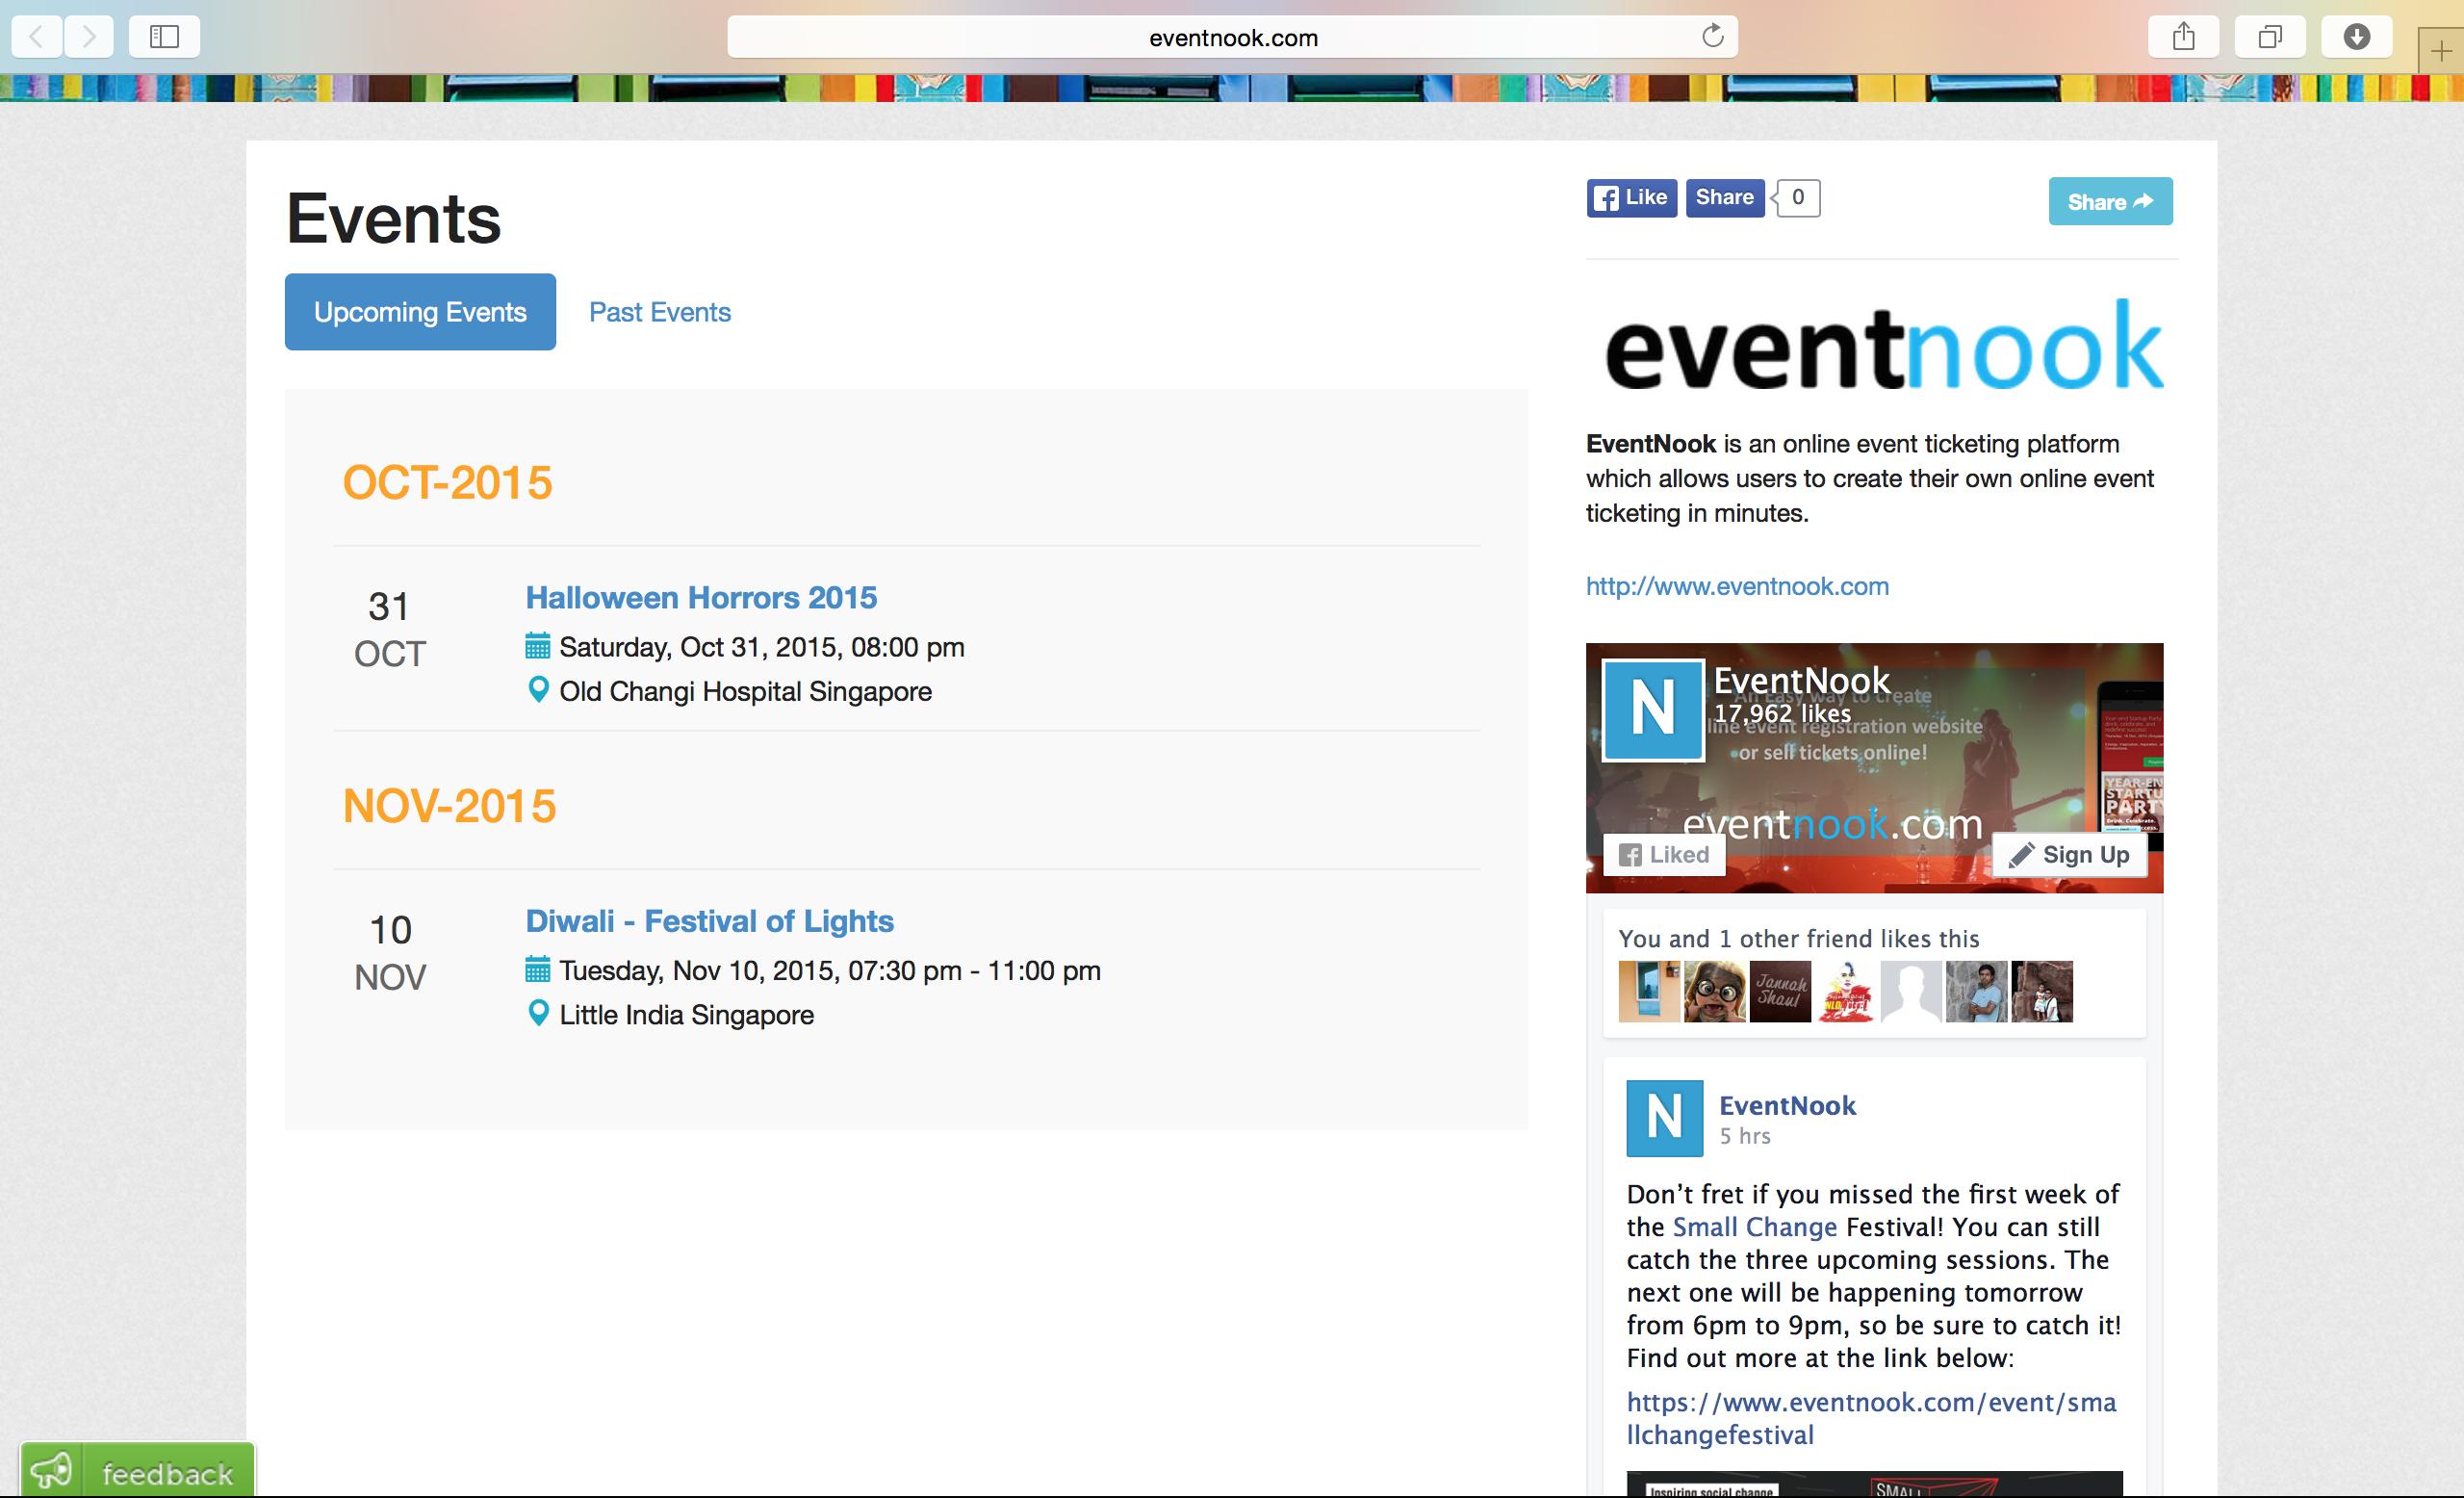 eventnook organiser profile page